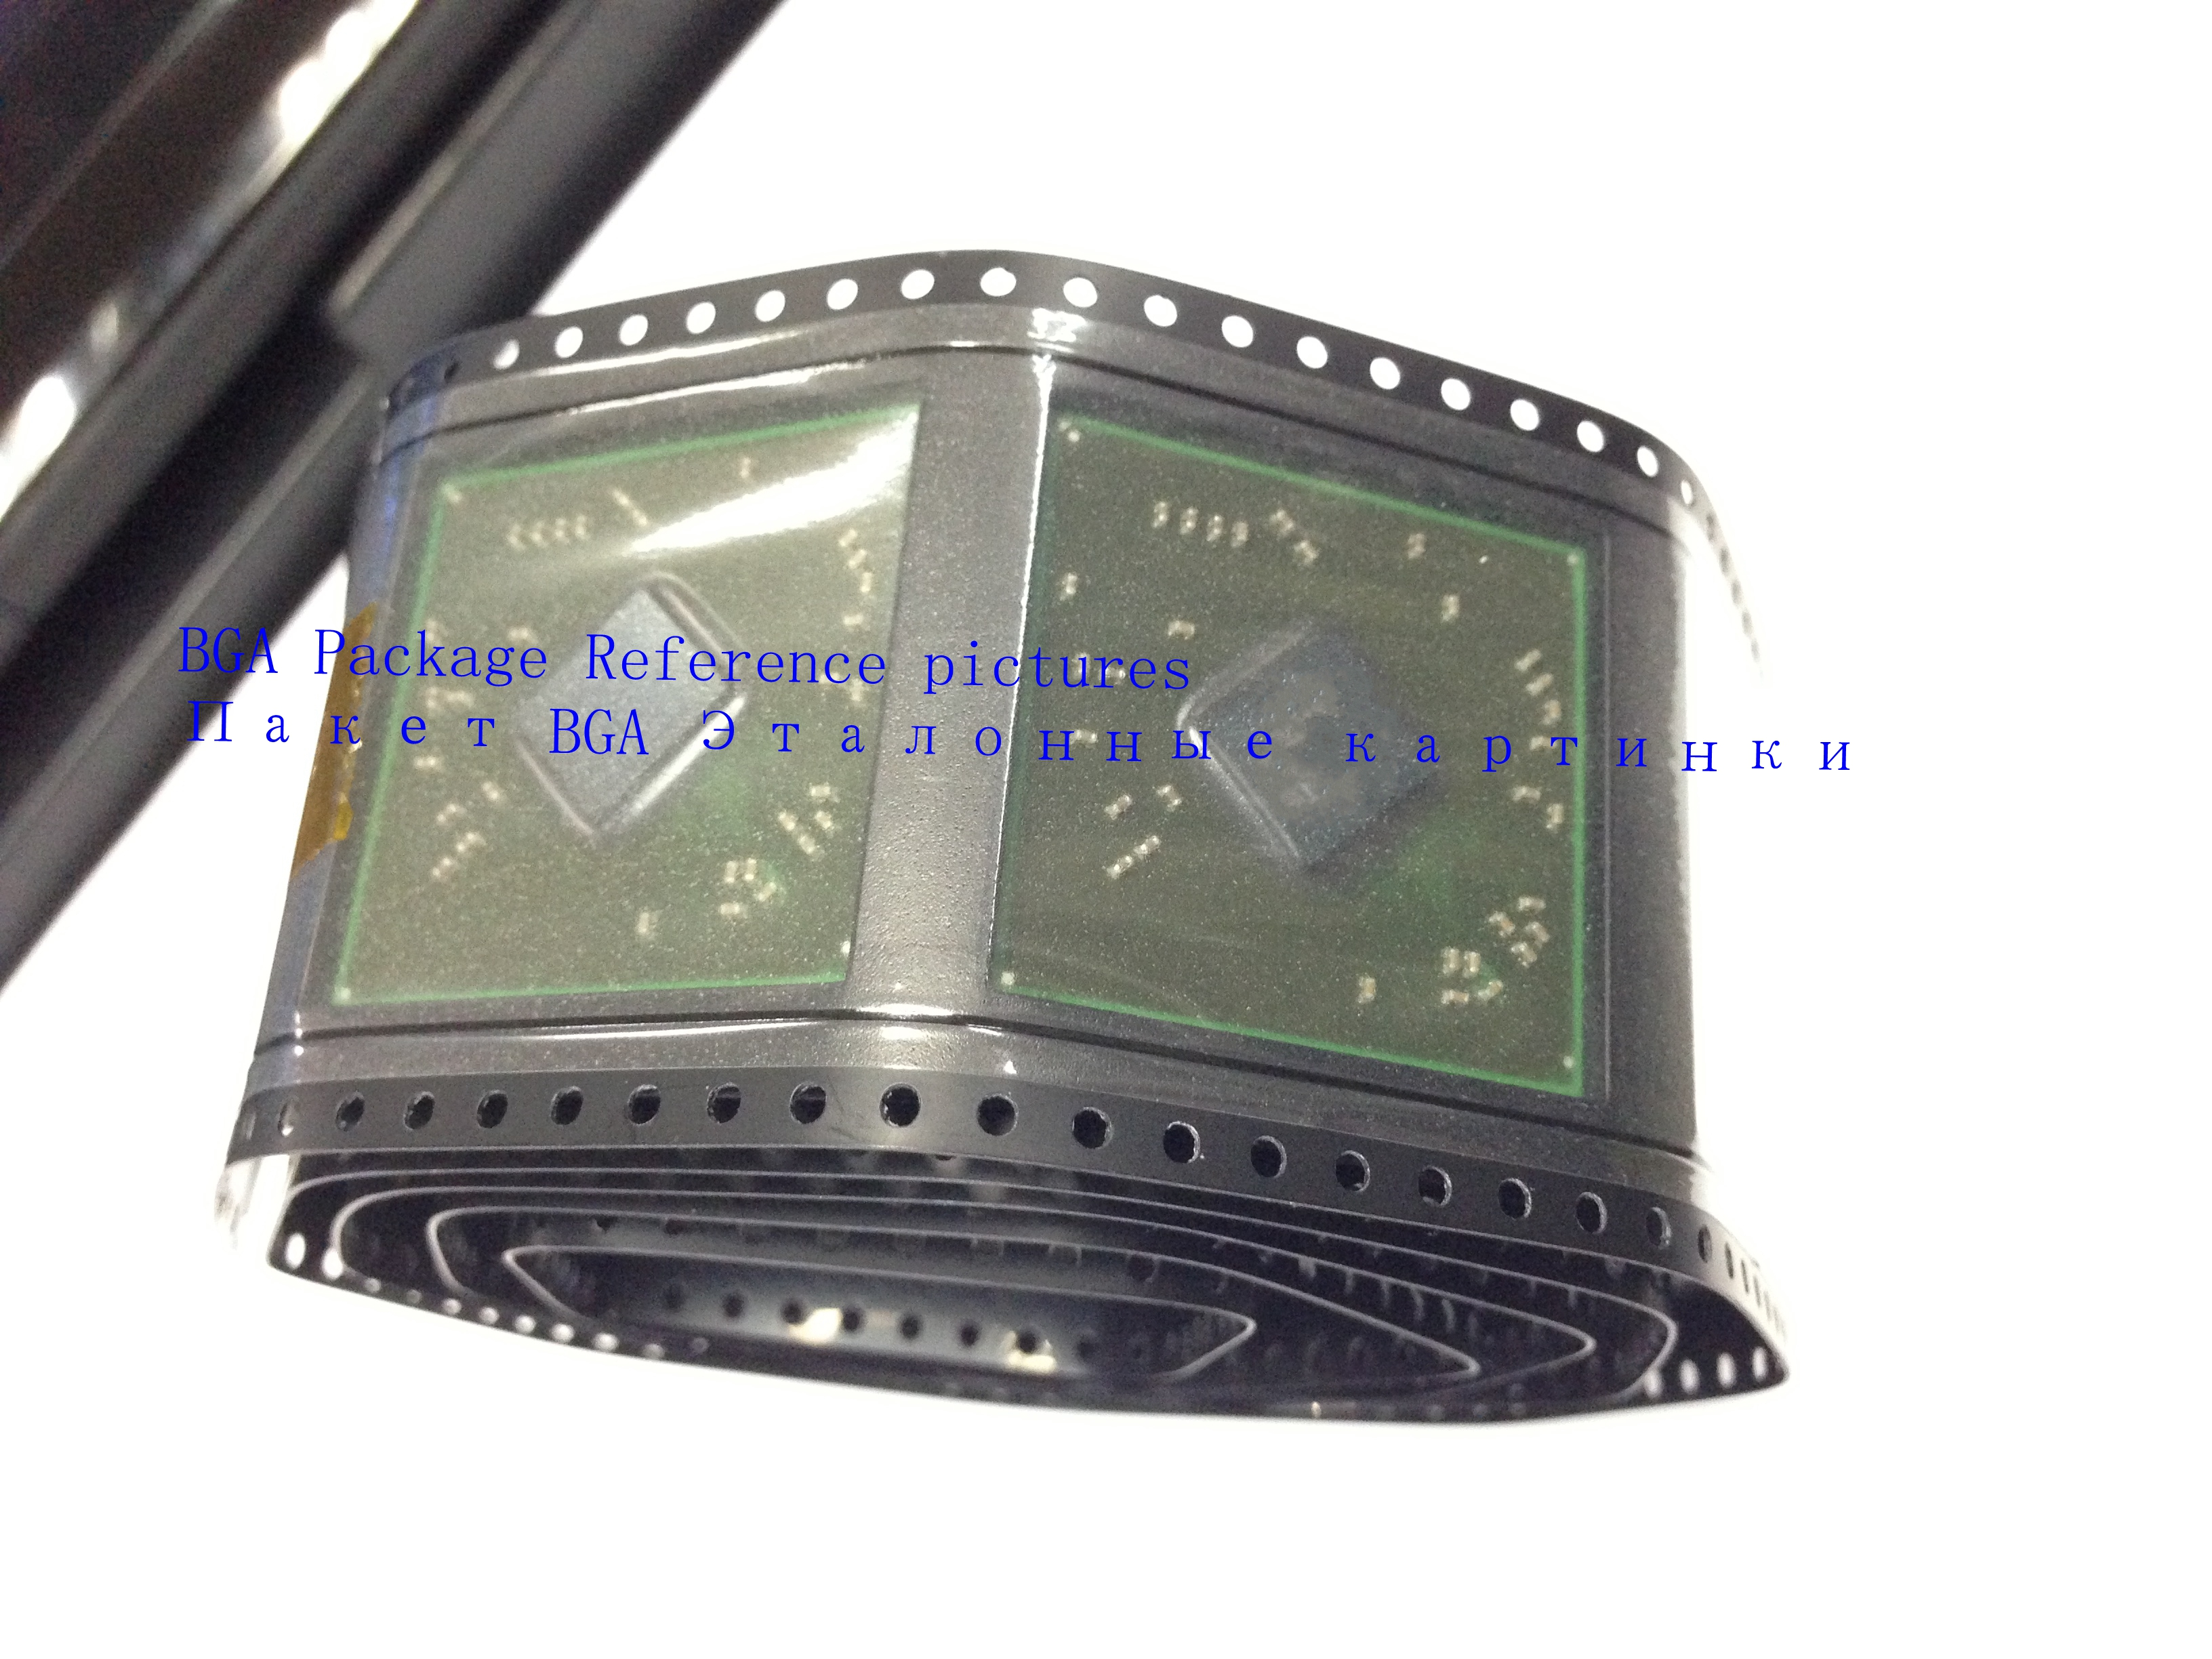 1pcs/lot 100% New 218-0755097 218 0755097 BGA Chipset1pcs/lot 100% New 218-0755097 218 0755097 BGA Chipset